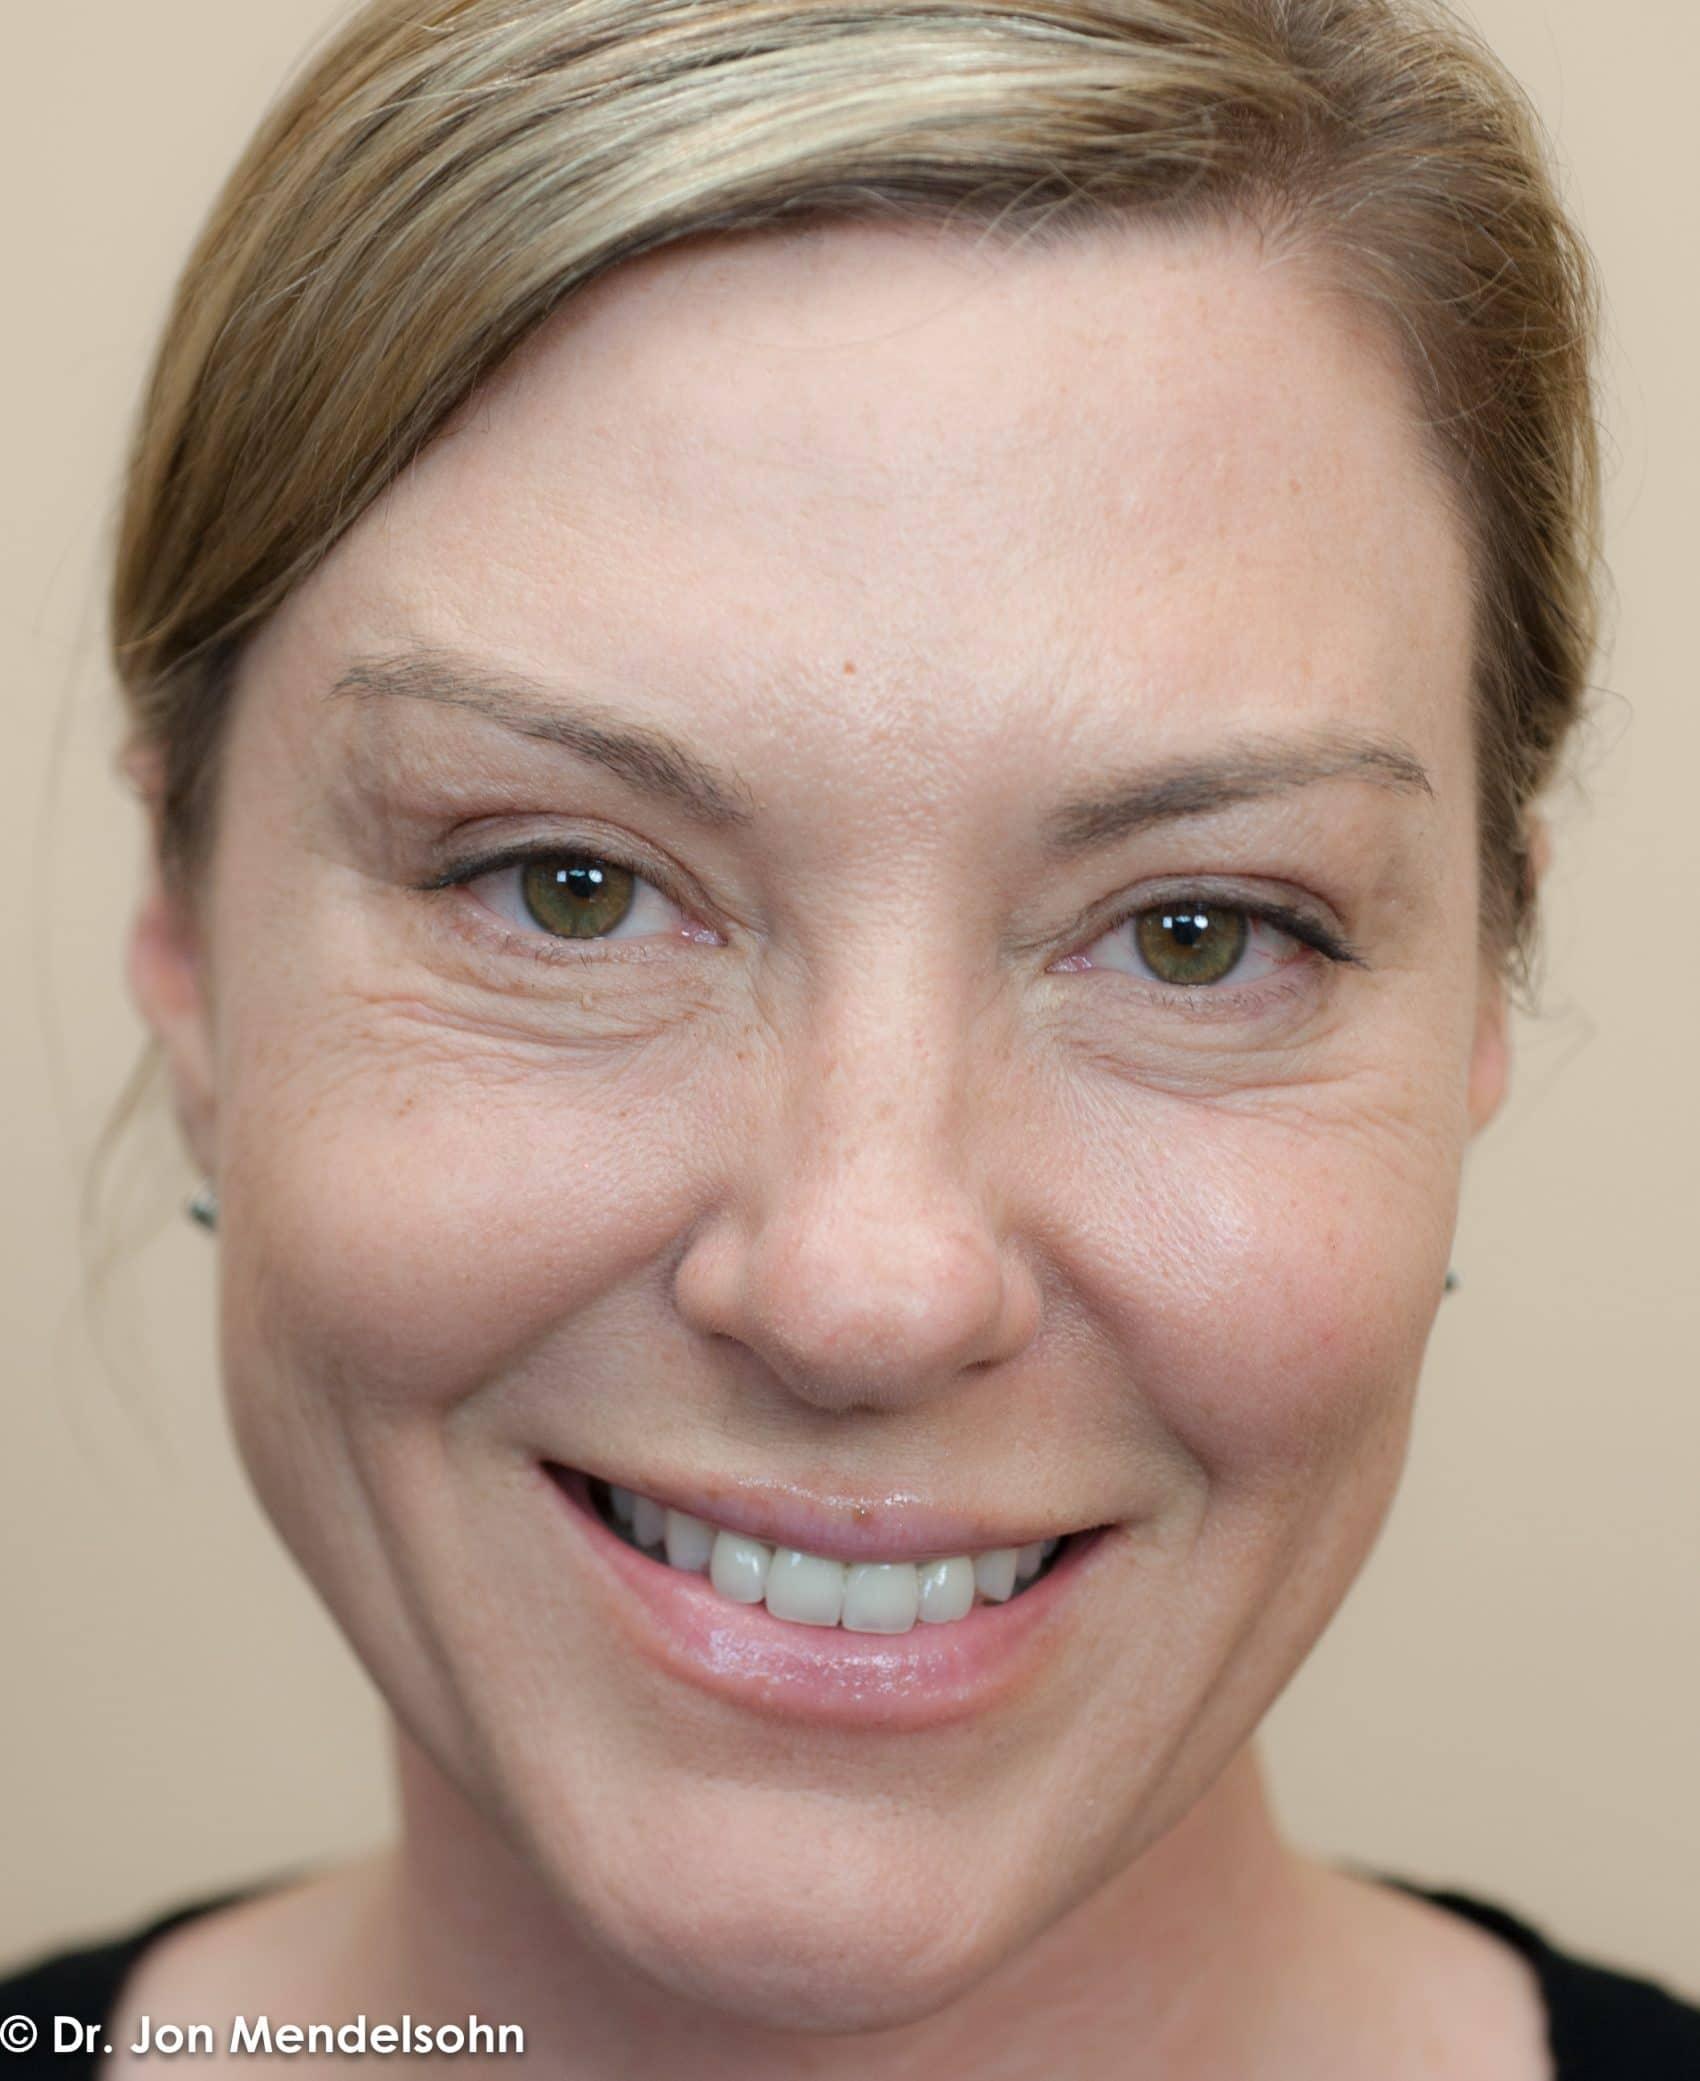 Upper-blepharoplasty-eyelid-surgery-cincinnati-dr-jon-mendelsohn-best-eyelid-surgery-plastic-surgery-realself-truseselfies-frontal-after-Krishock_Laurissa-15820-2